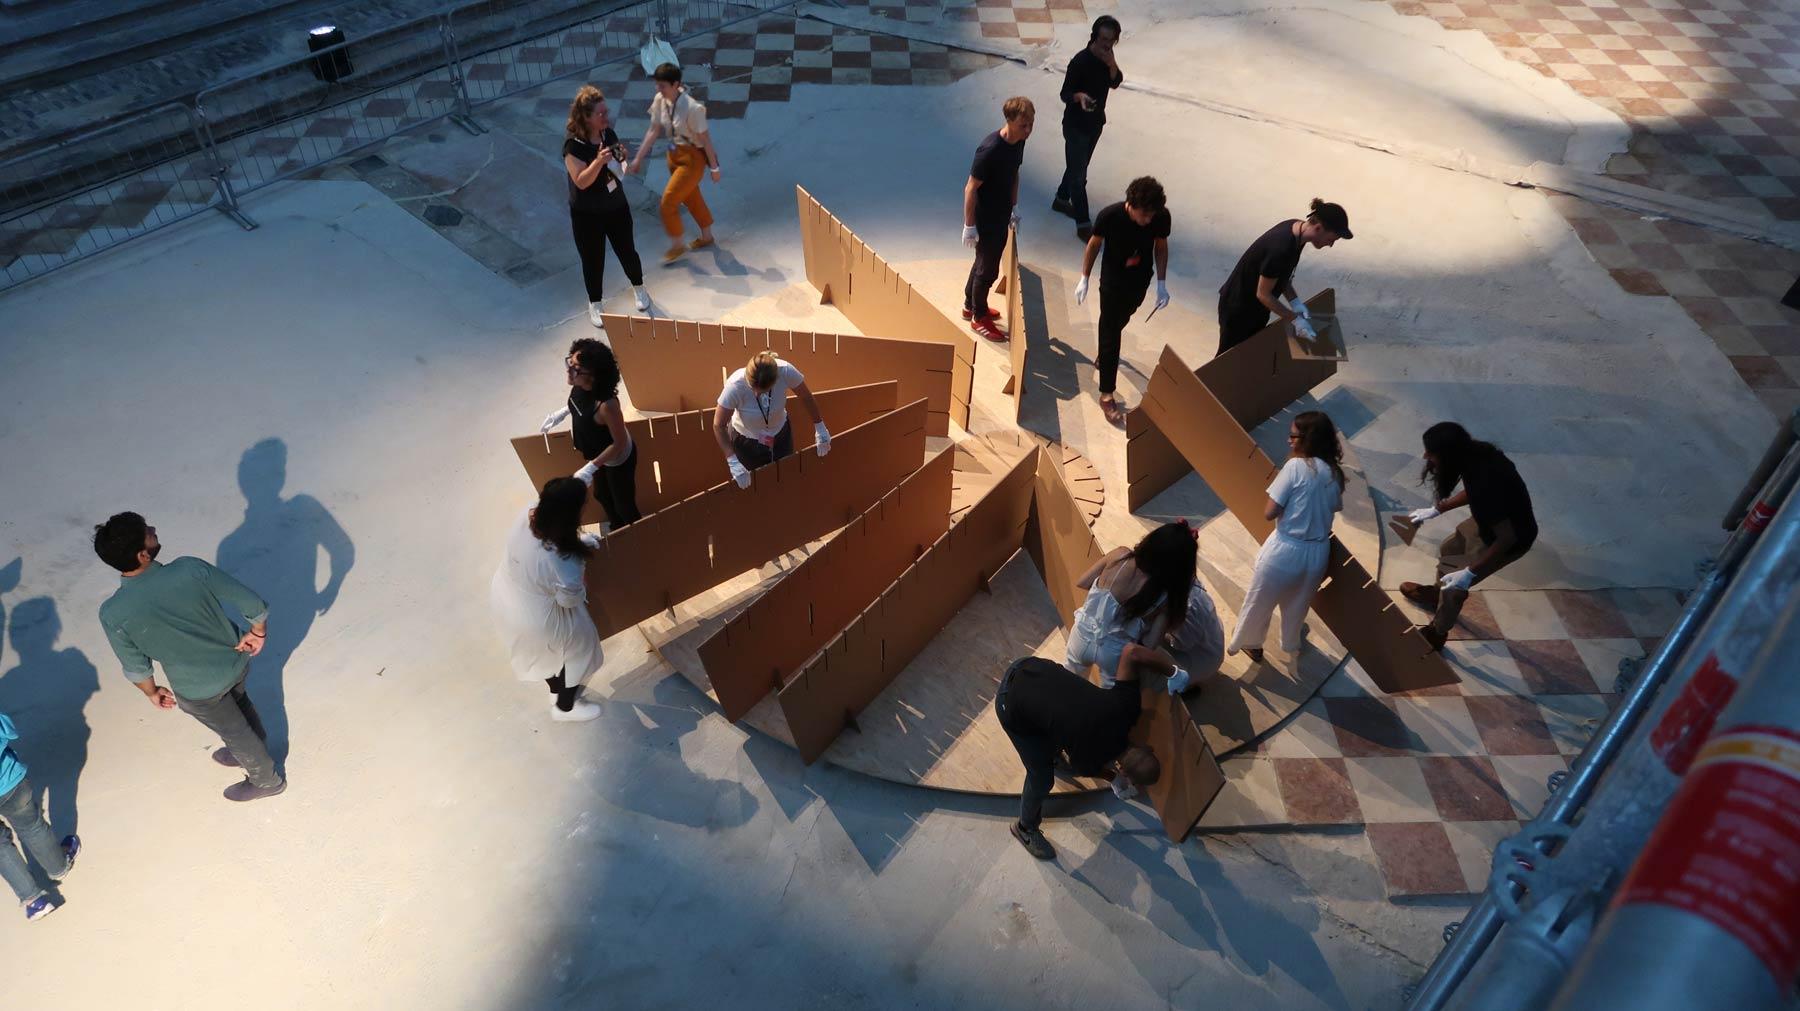 montaje estructura escenografia de carton venecia